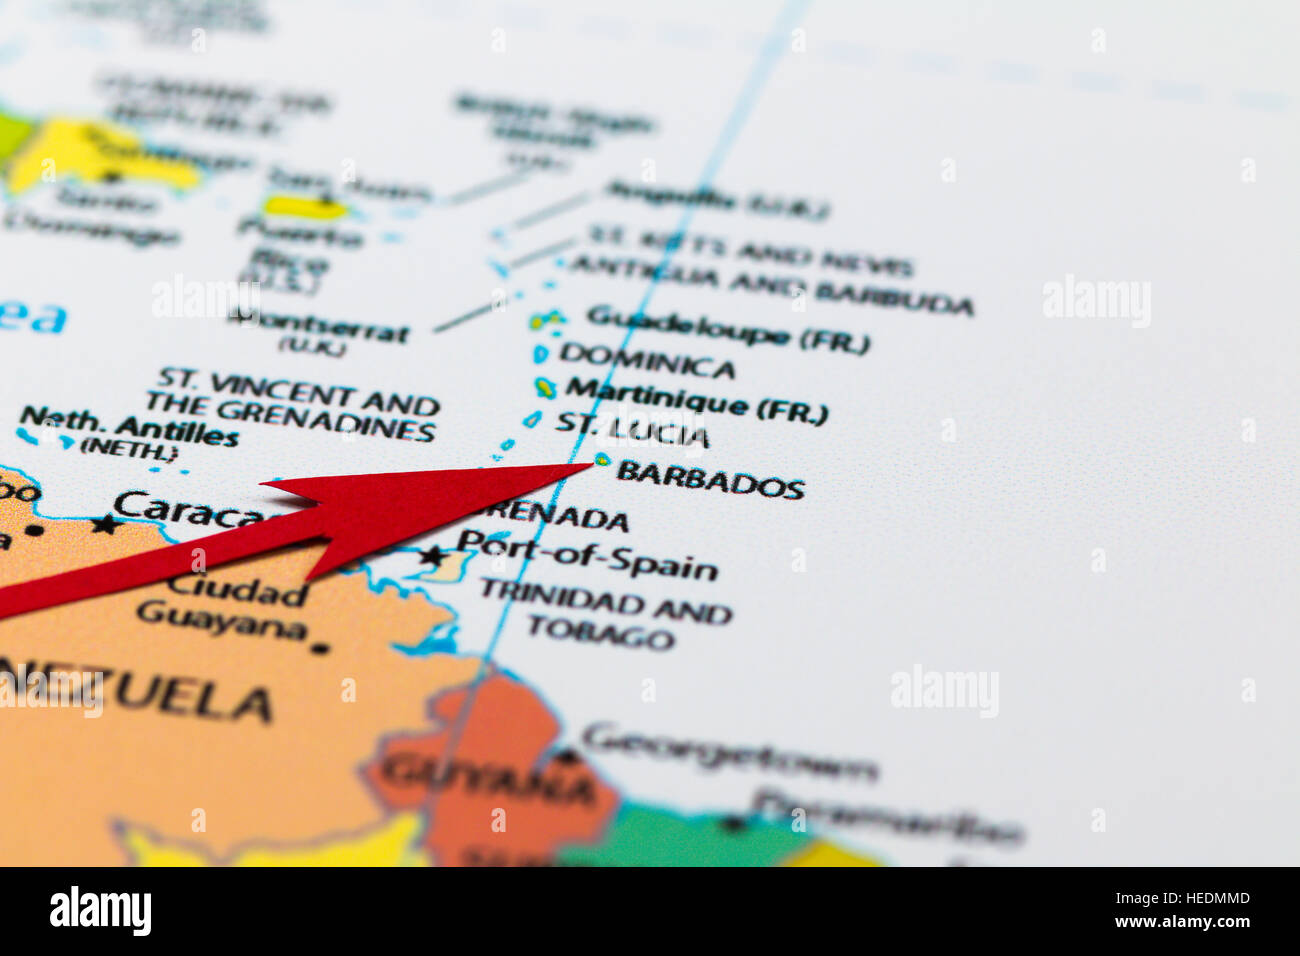 Barbados Island Map Stock Photos & Barbados Island Map Stock ... on find barbados on world map, rome st. peter st. paul map, saint philip barbados, equal area world map, norway on world map, barbados location on world map, saint james barbados, map of barbados on world map, list cities on world map, bridgetown barbados on world map, barbados on a world map, bahamas location on world map,